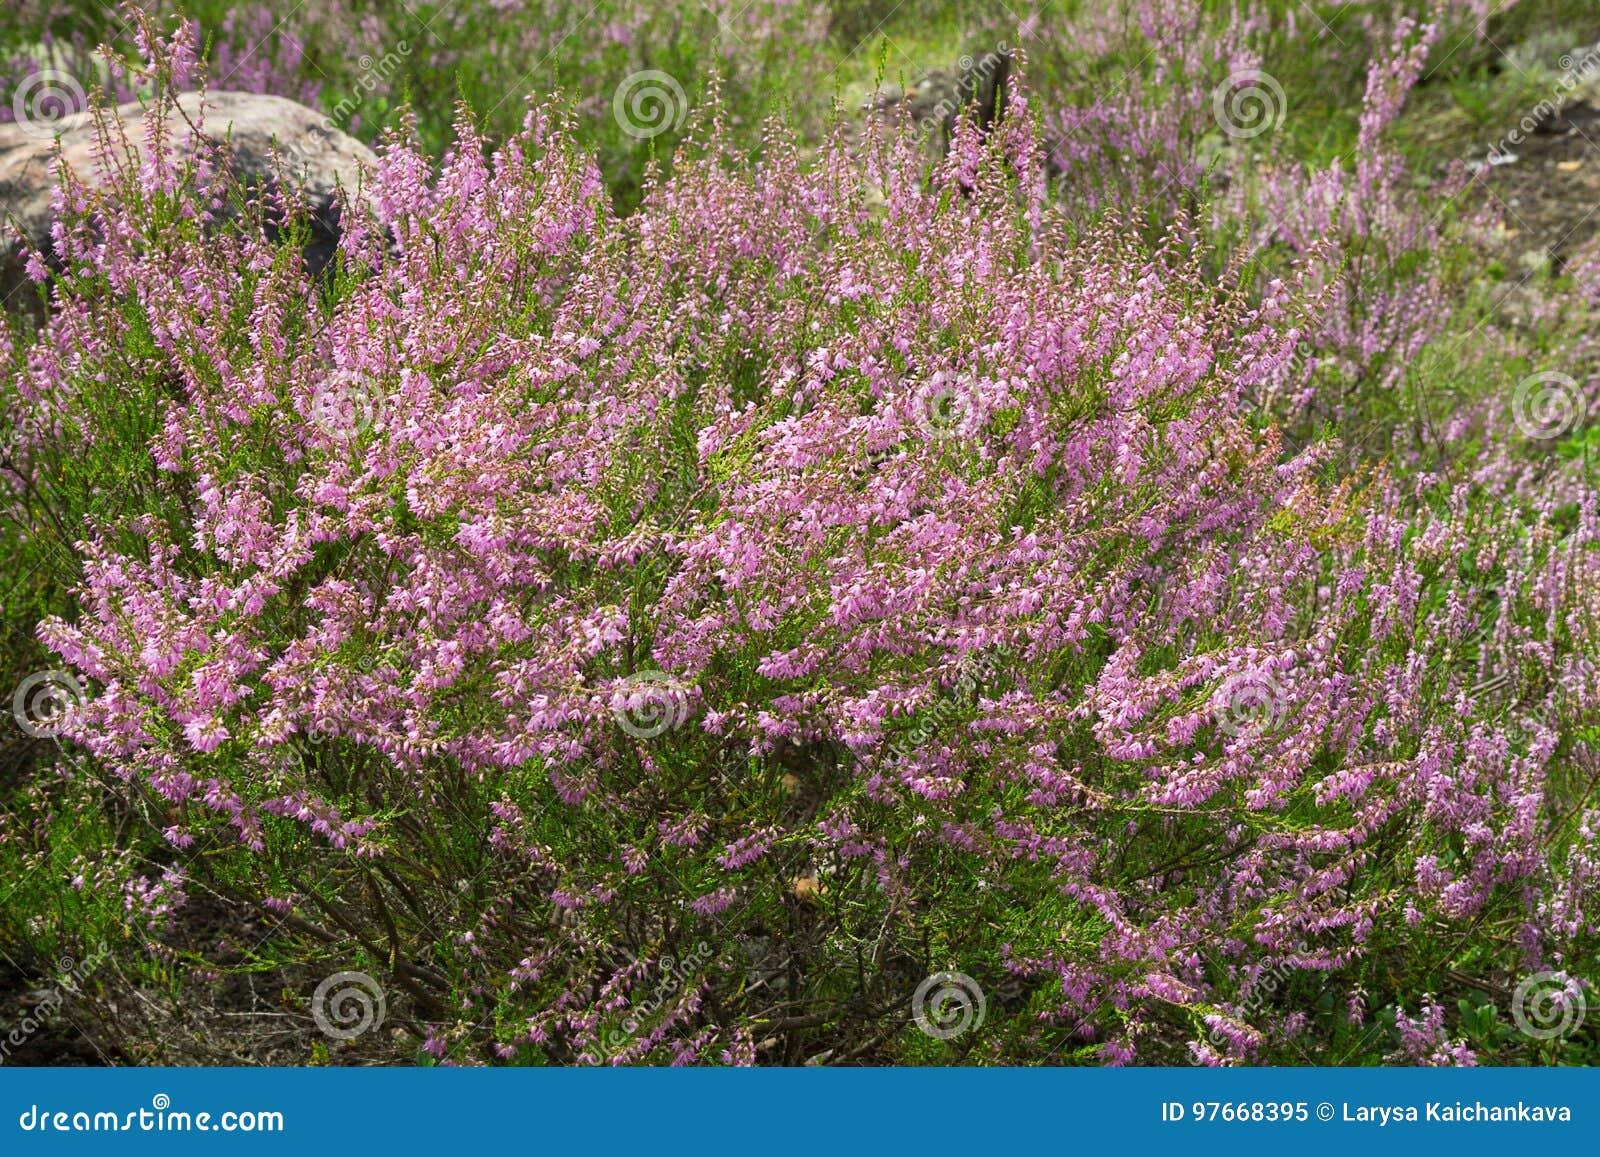 Heather purple flowers stock image image of flower heathery 97668395 heather purple flowers calluna evergreen shrub small leaves pink bee flies flower to flower wind shakes 97668395g mightylinksfo